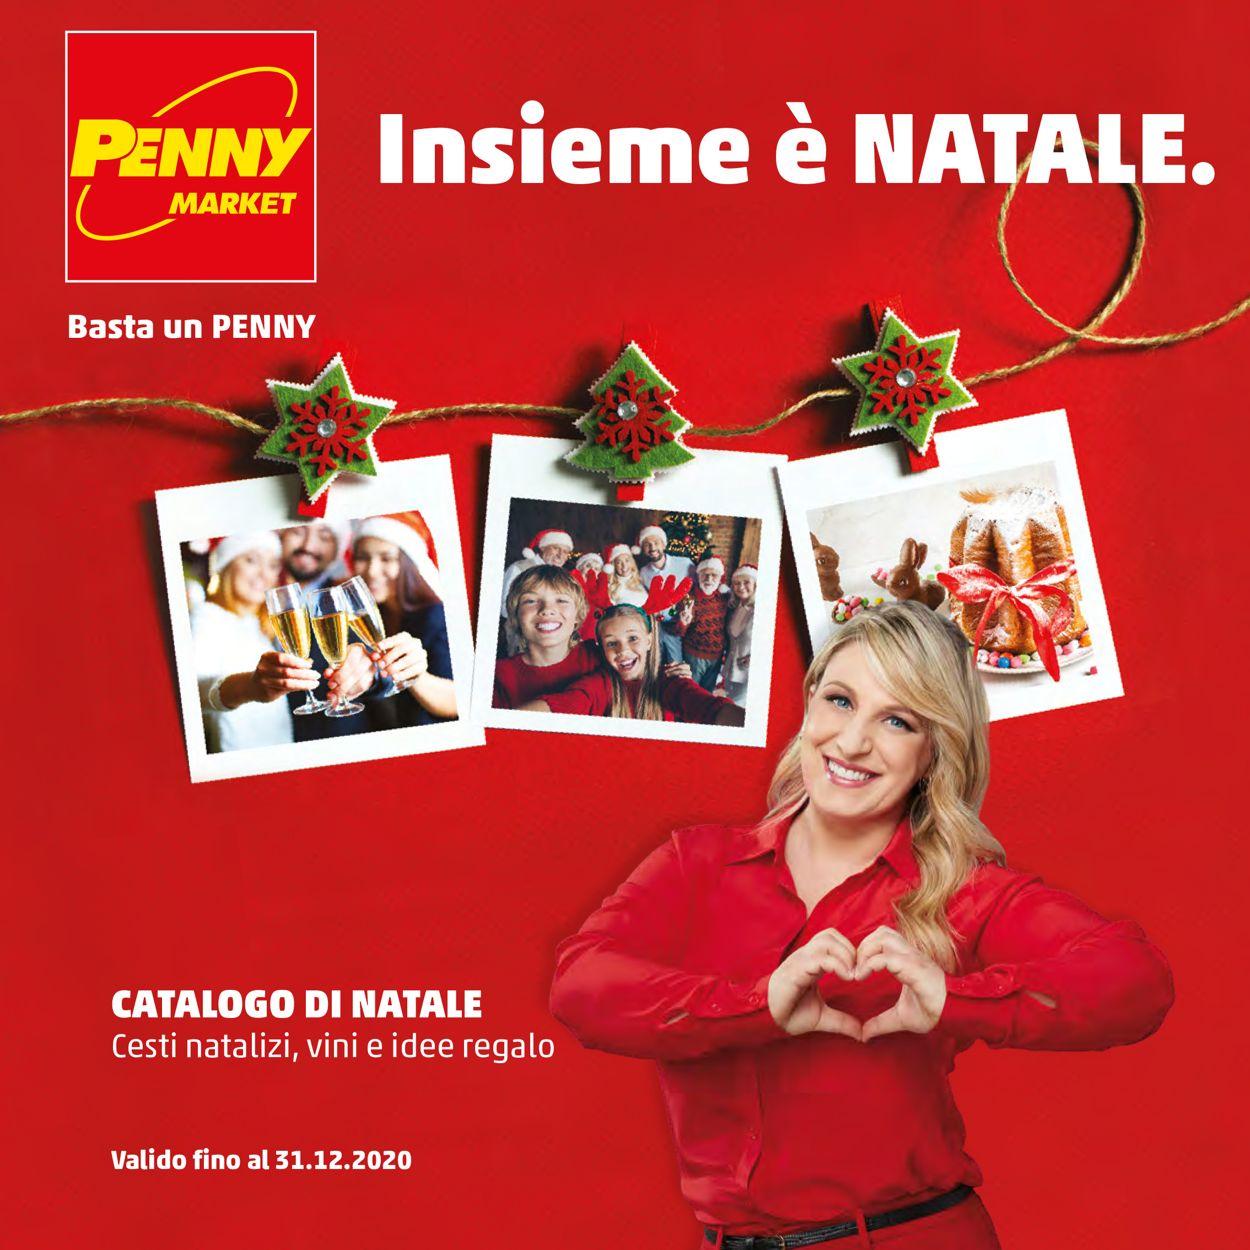 Volantino Penny Market - Natale 2020 - Offerte 12/11-31/12/2020